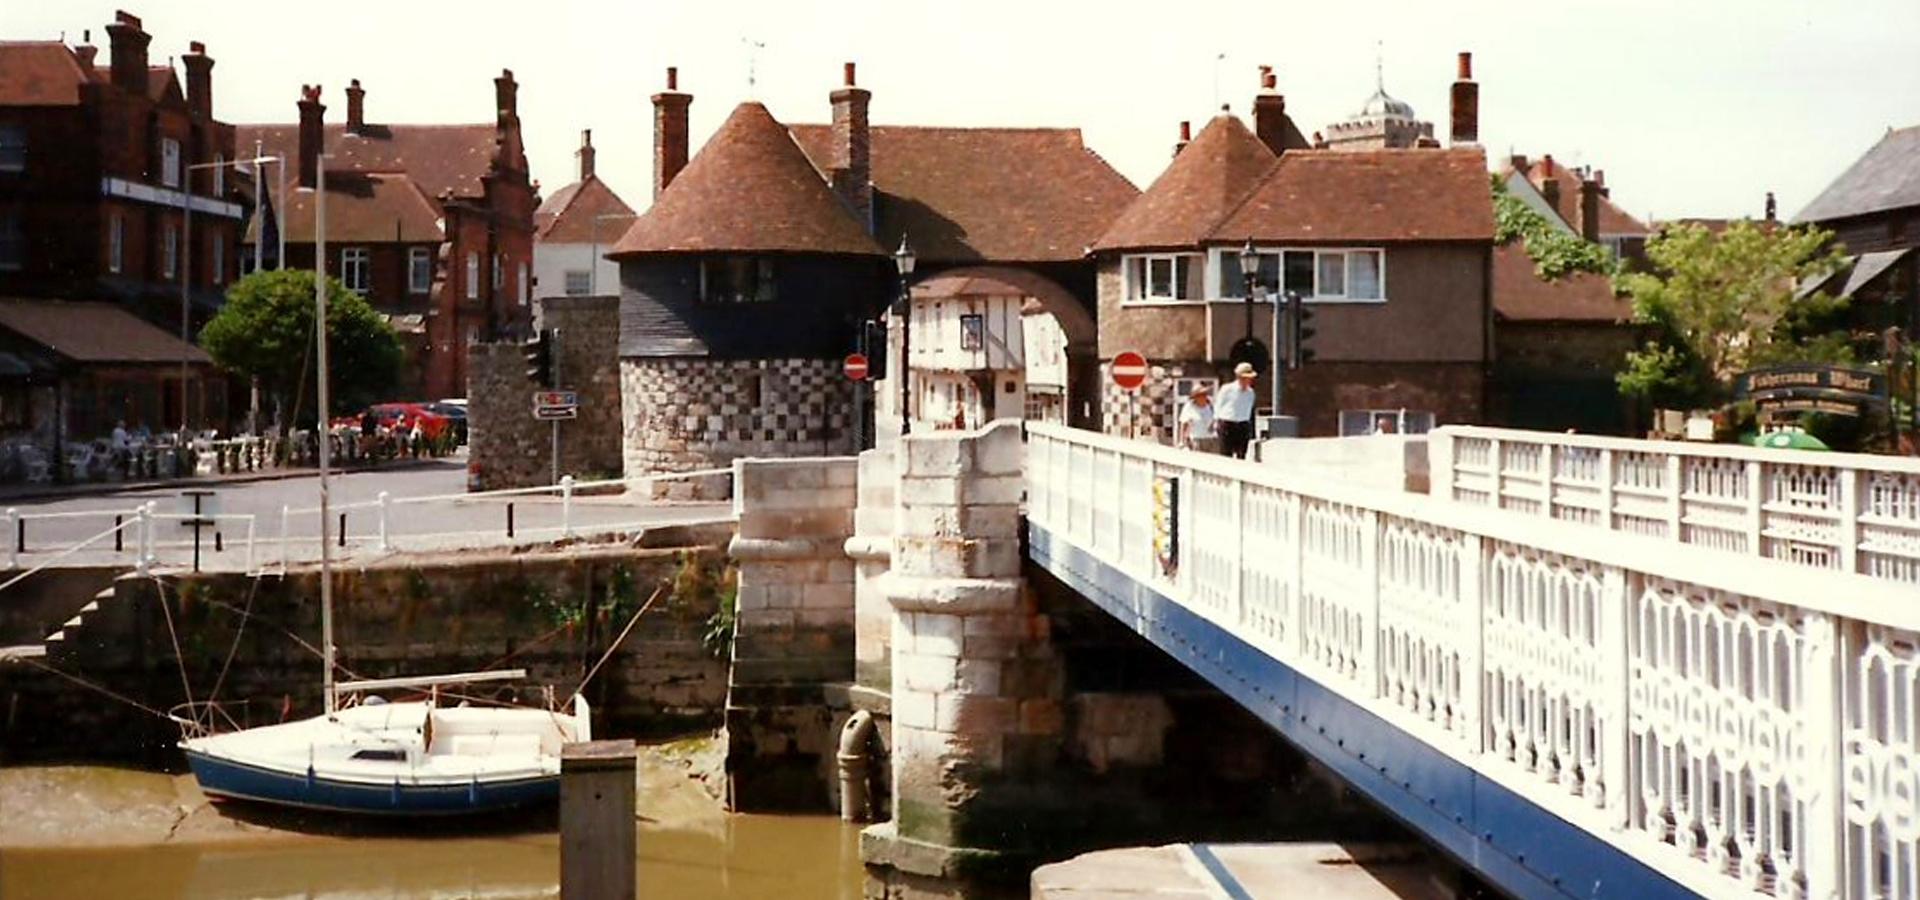 <b>Sandwich, Kent, England, Great Britain</b>